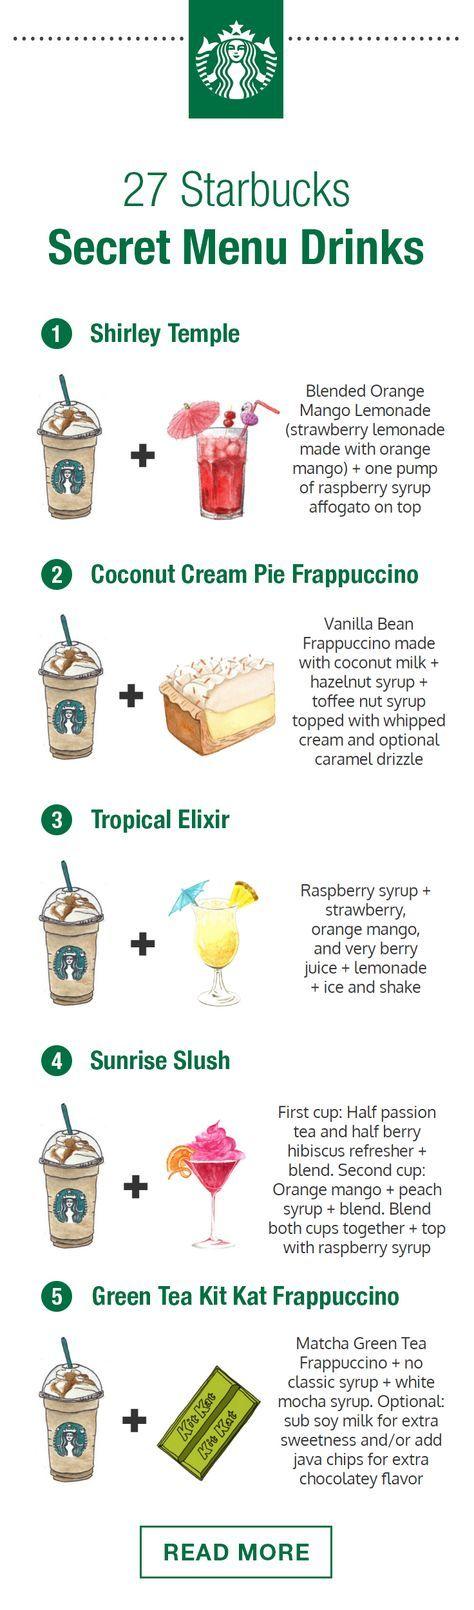 27 Starbucks Secret Menu Drinks You'll Be Ordering All Summer